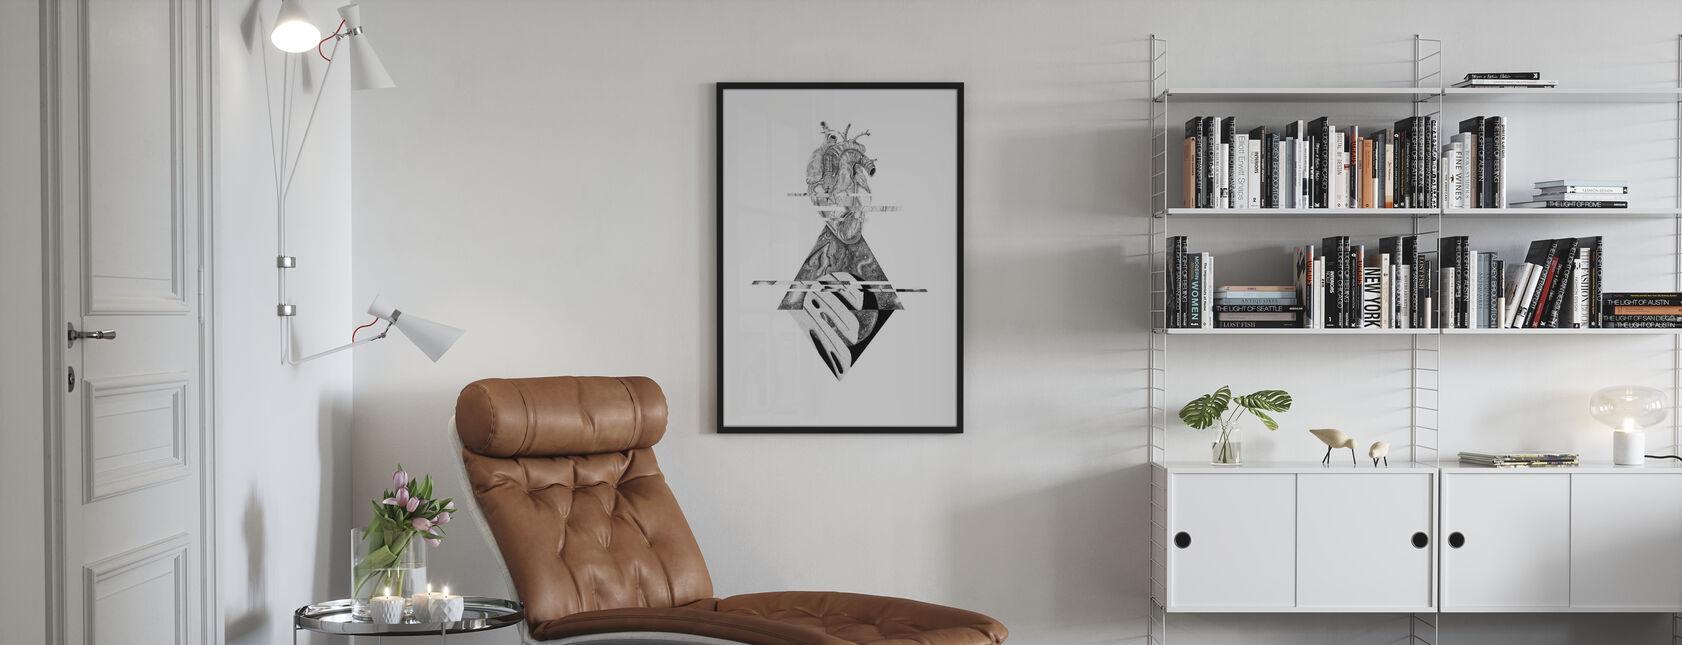 Avbrutet universum III - Poster - Vardagsrum